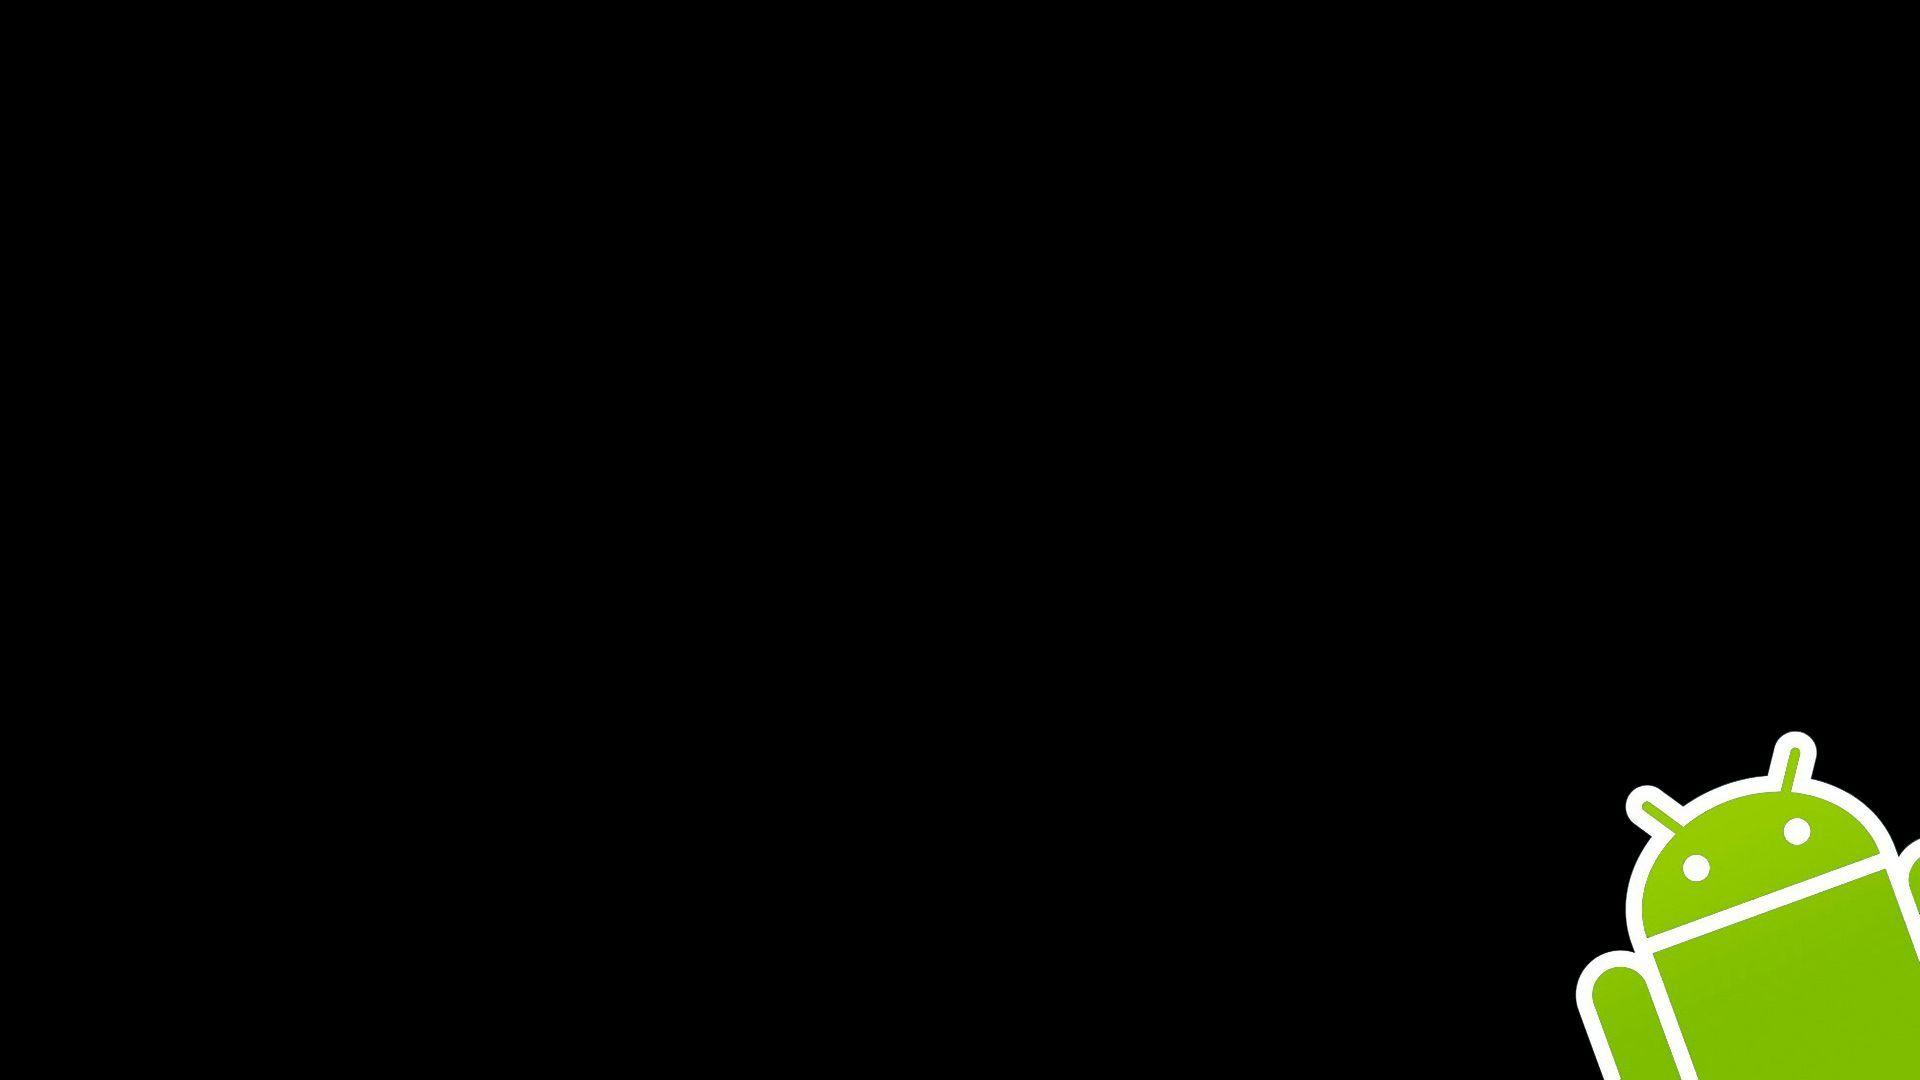 black android wallpaper wallpaper color